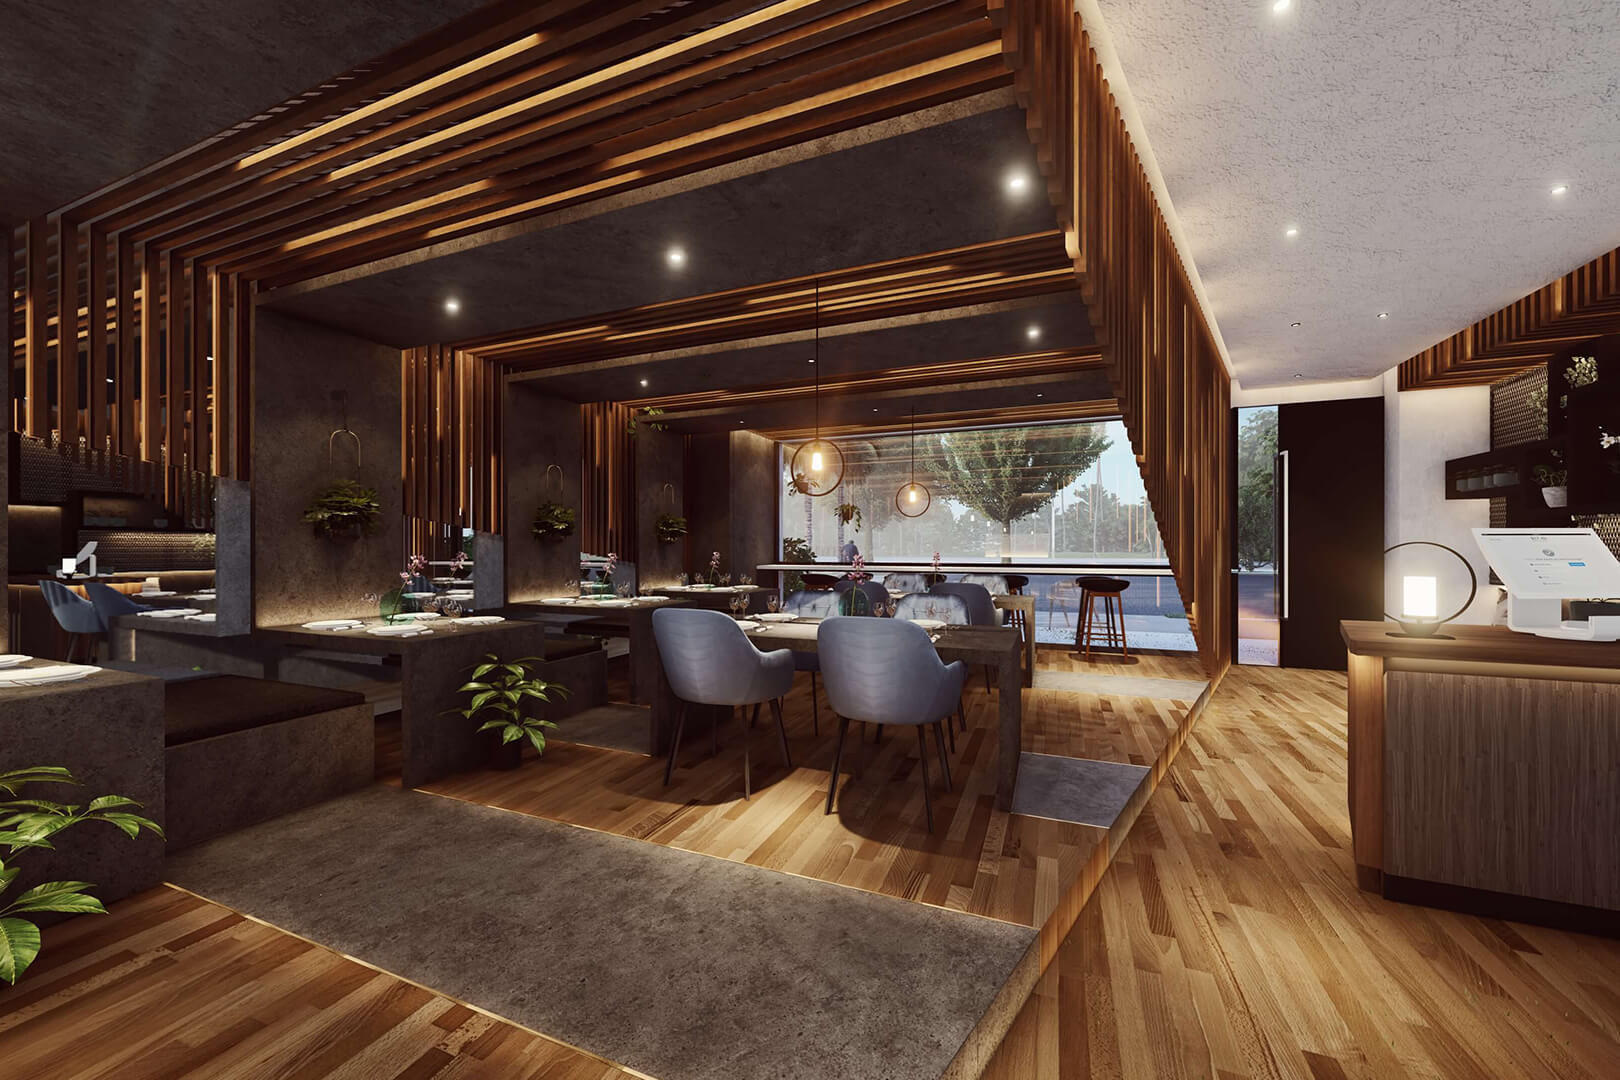 Pakington Cafe designed by Sky Architect Studio